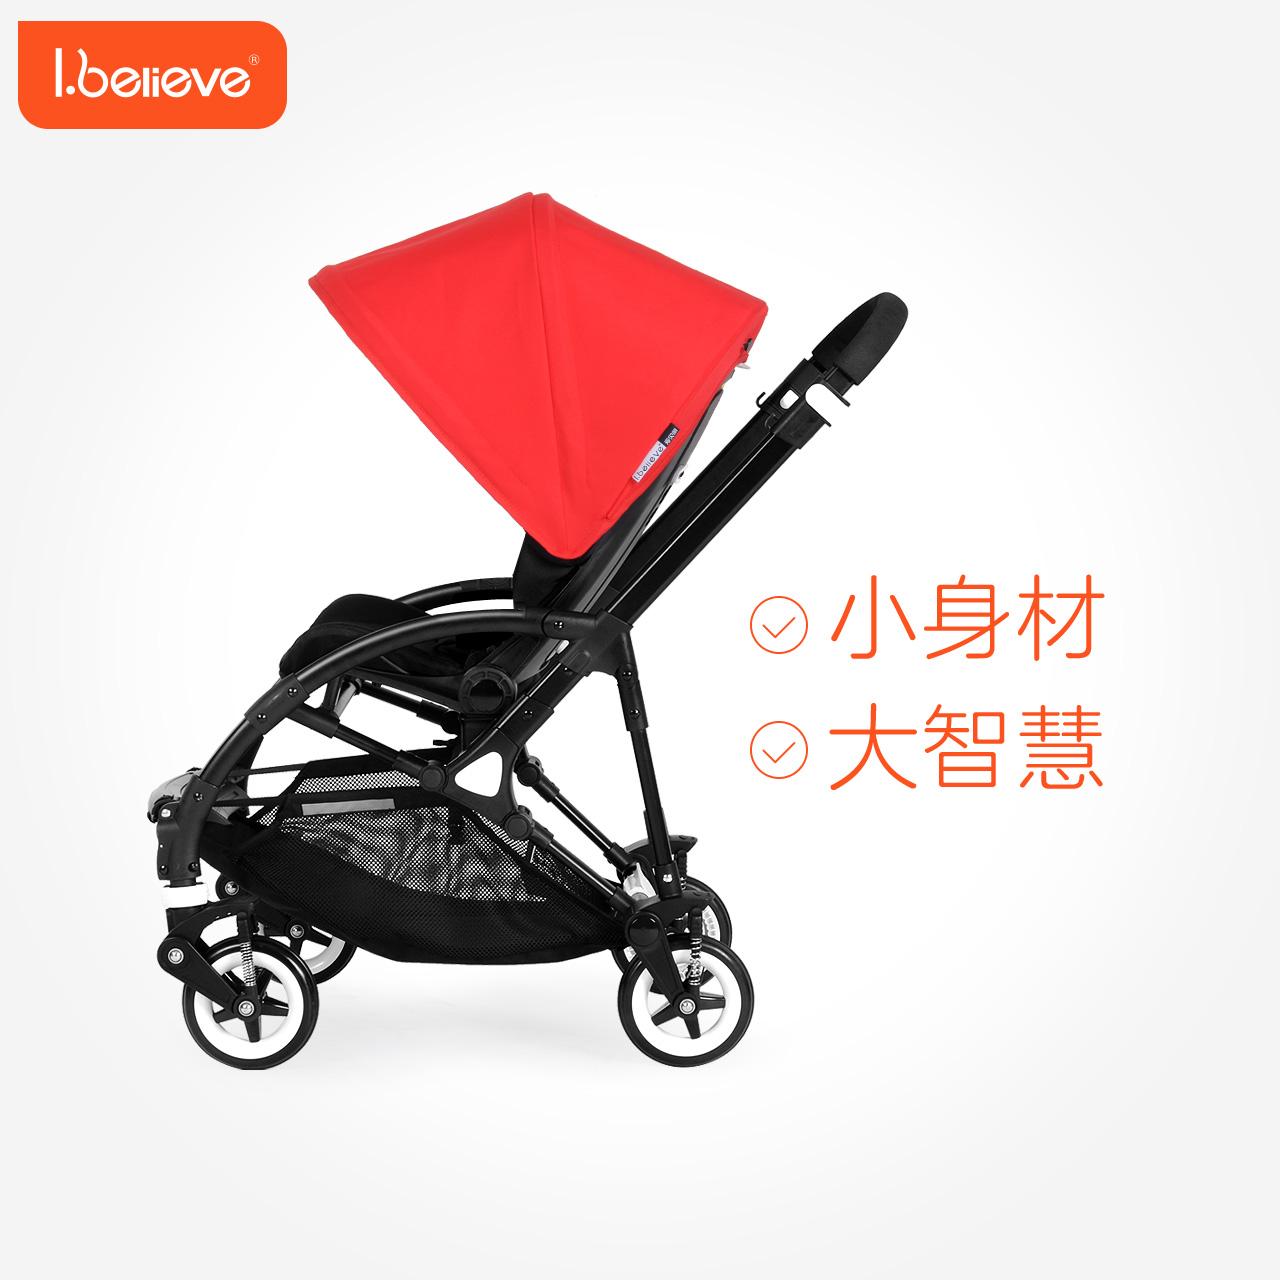 Ibelieve爱贝丽轻便伞车婴儿推车四轮避震折叠可坐可躺儿童婴儿车